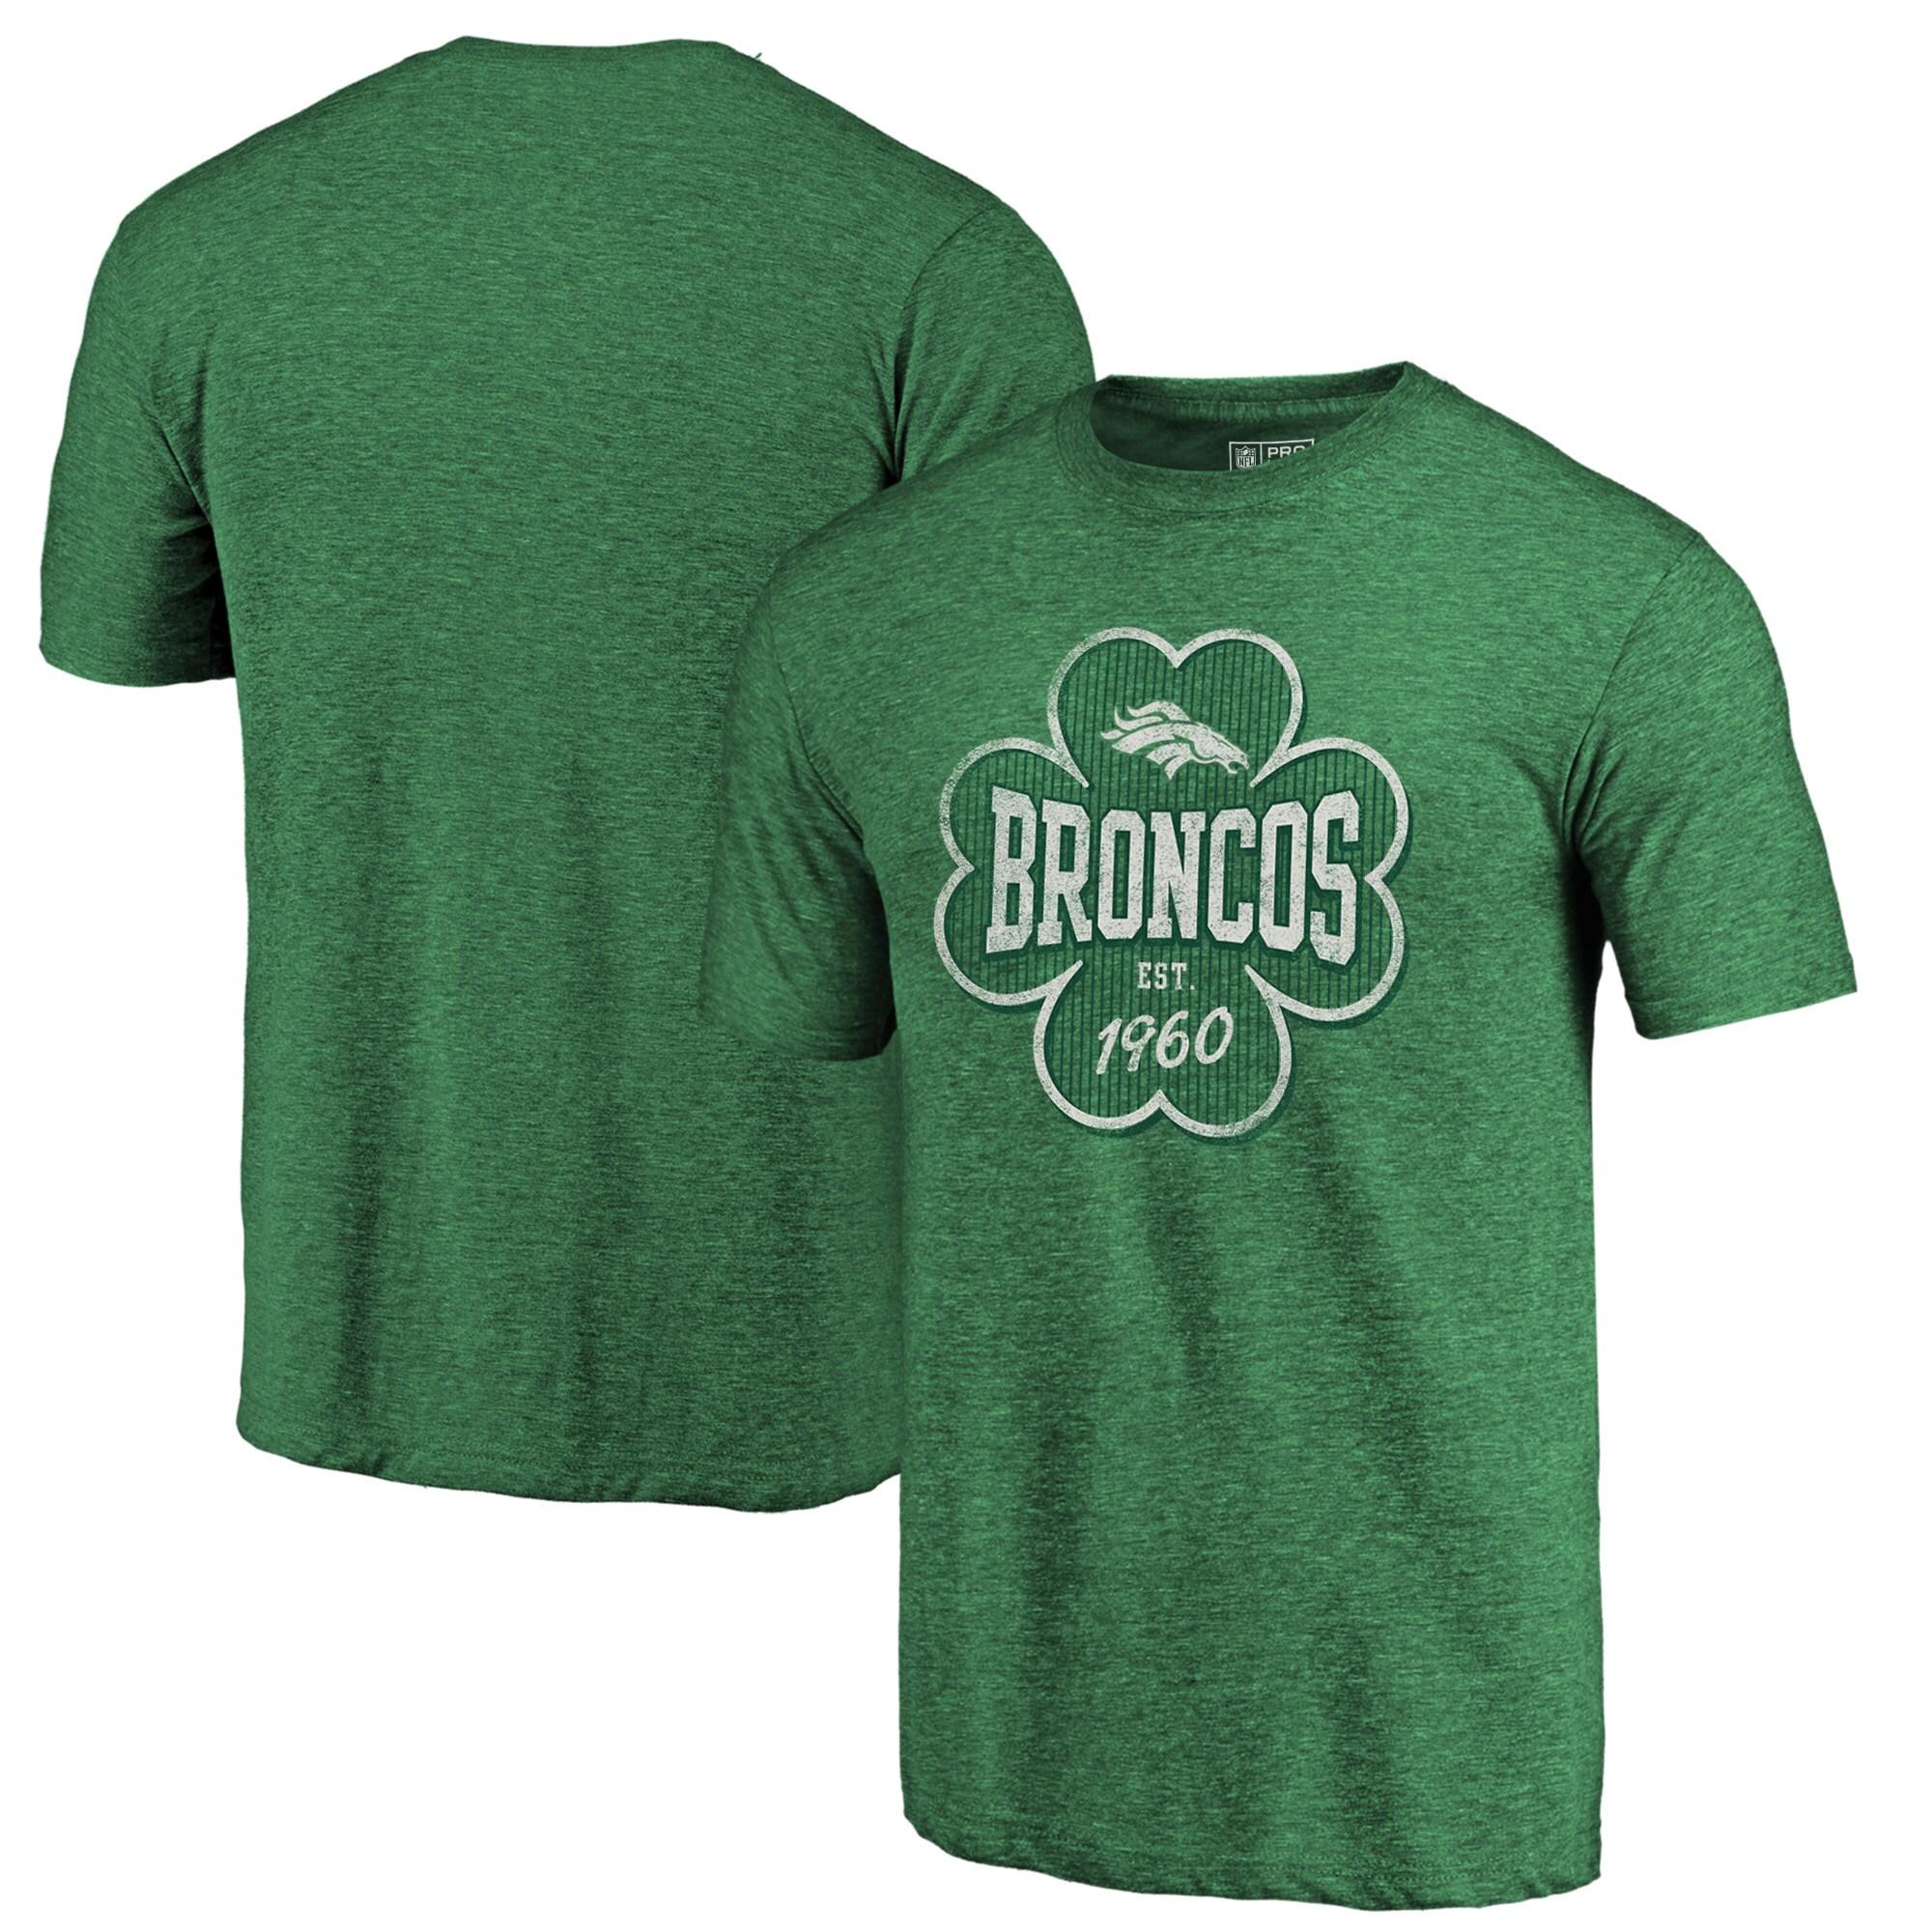 Denver Broncos NFL Pro Line by Fanatics Branded Emerald Isle Tri-Blend T-Shirt - Kelly Green